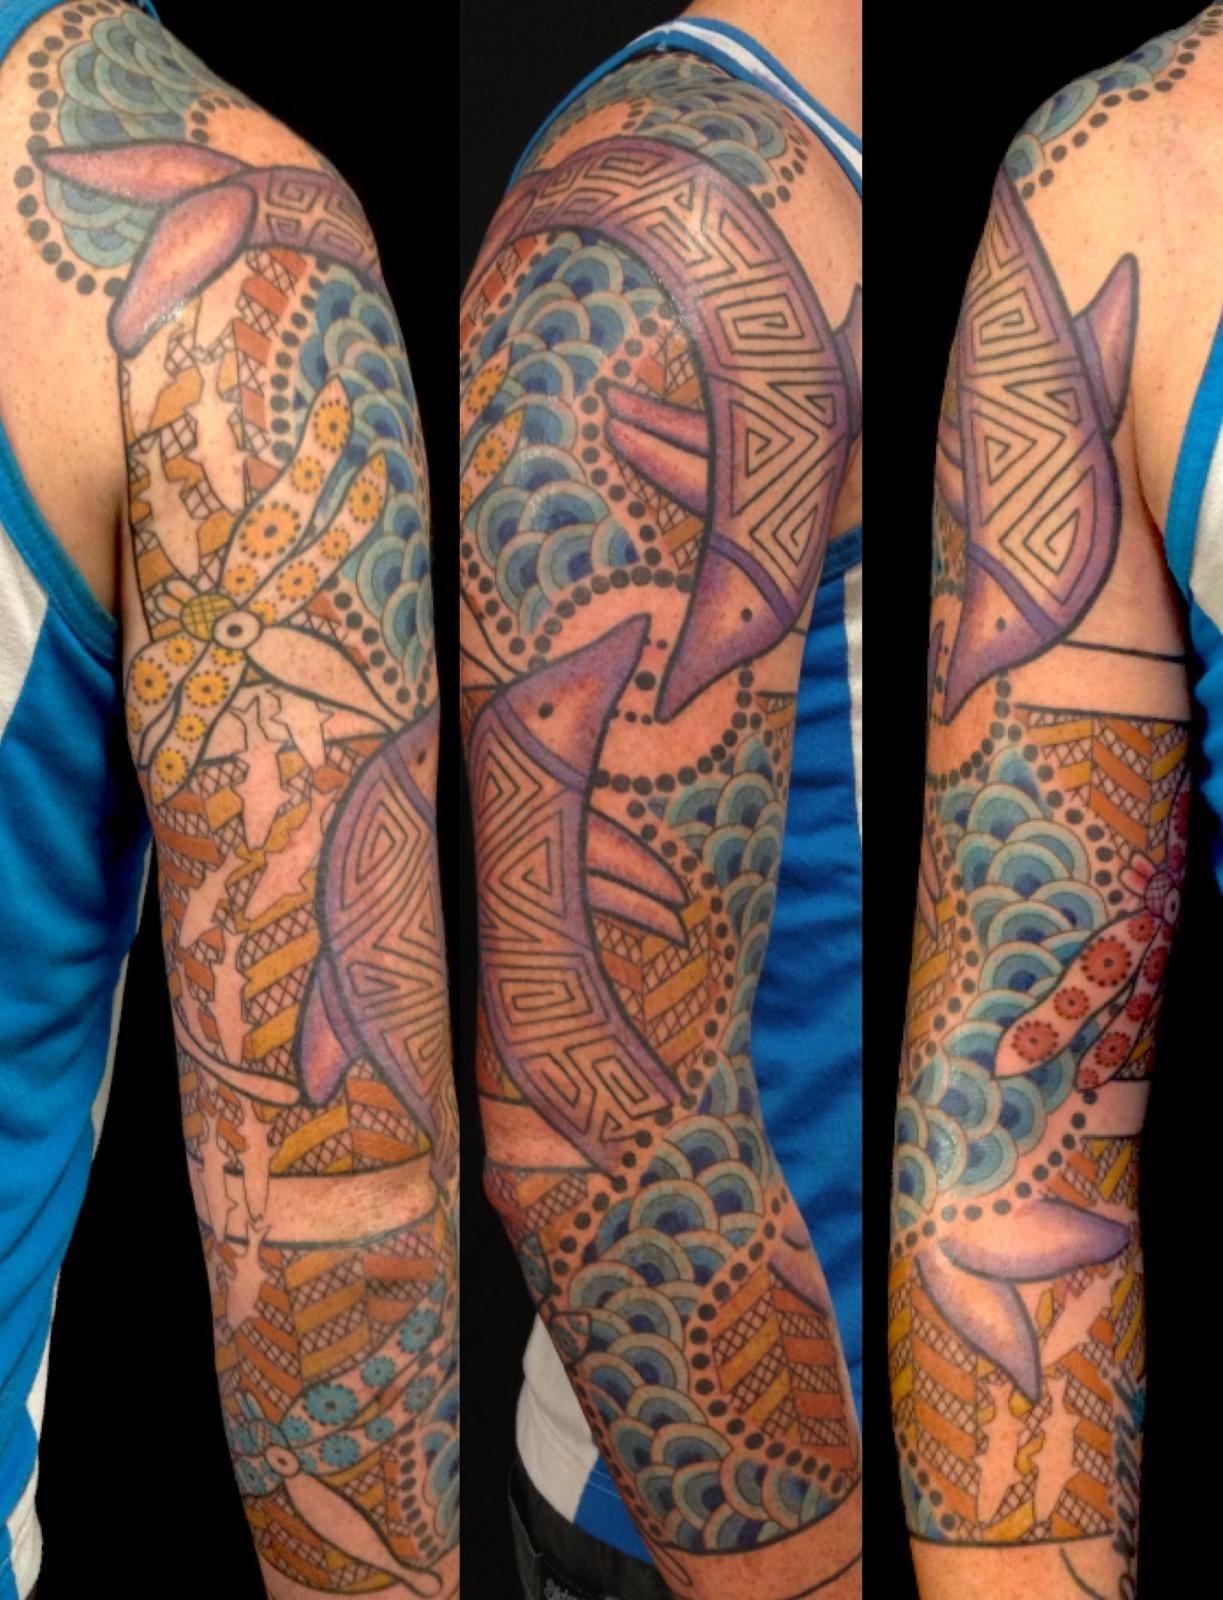 tattoo sleeve cover up forearm australia